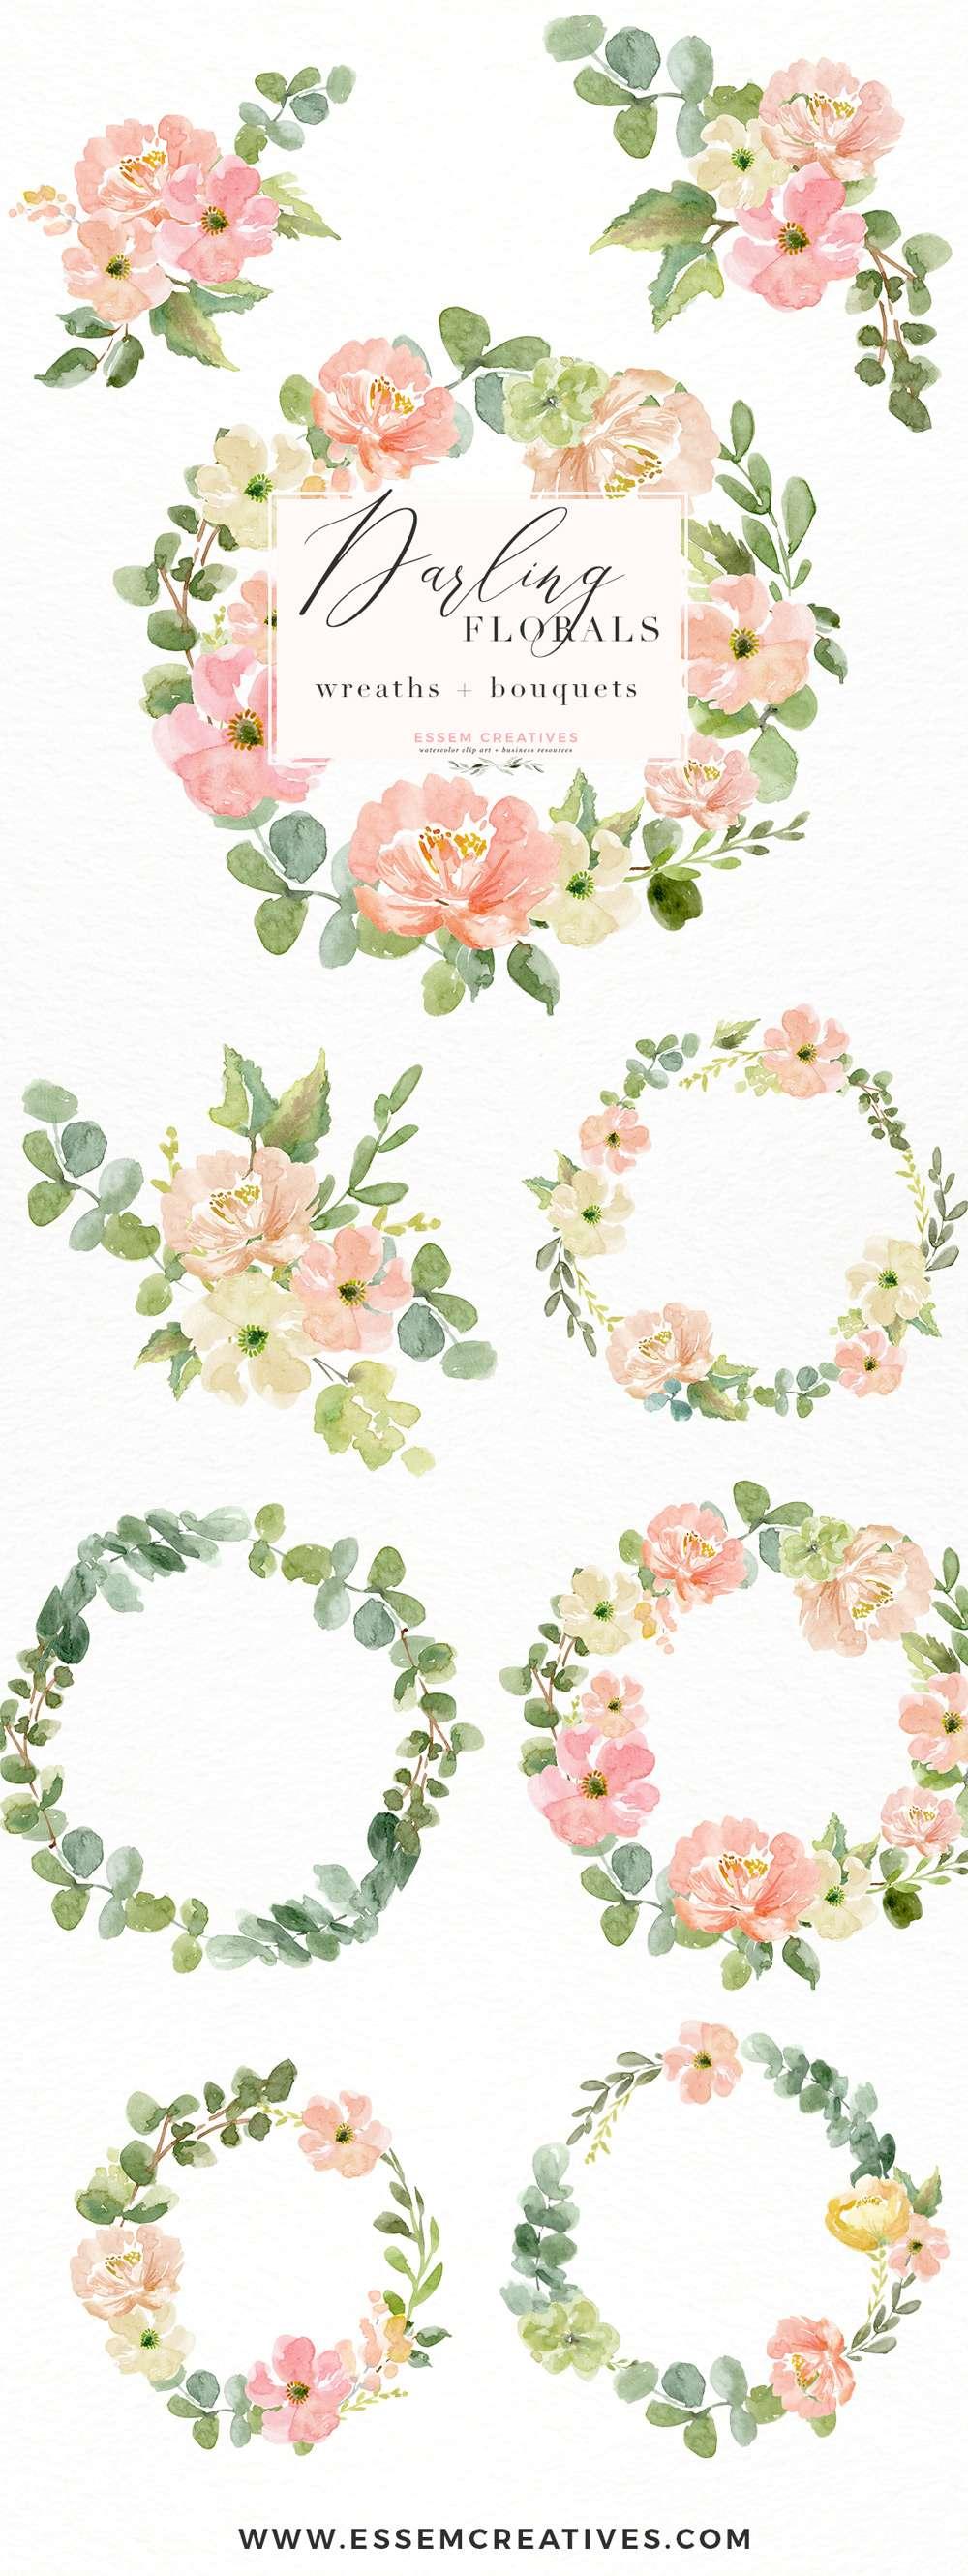 Watercolor Wreath PNG Clipart, Watercolor Flowers Bouquet